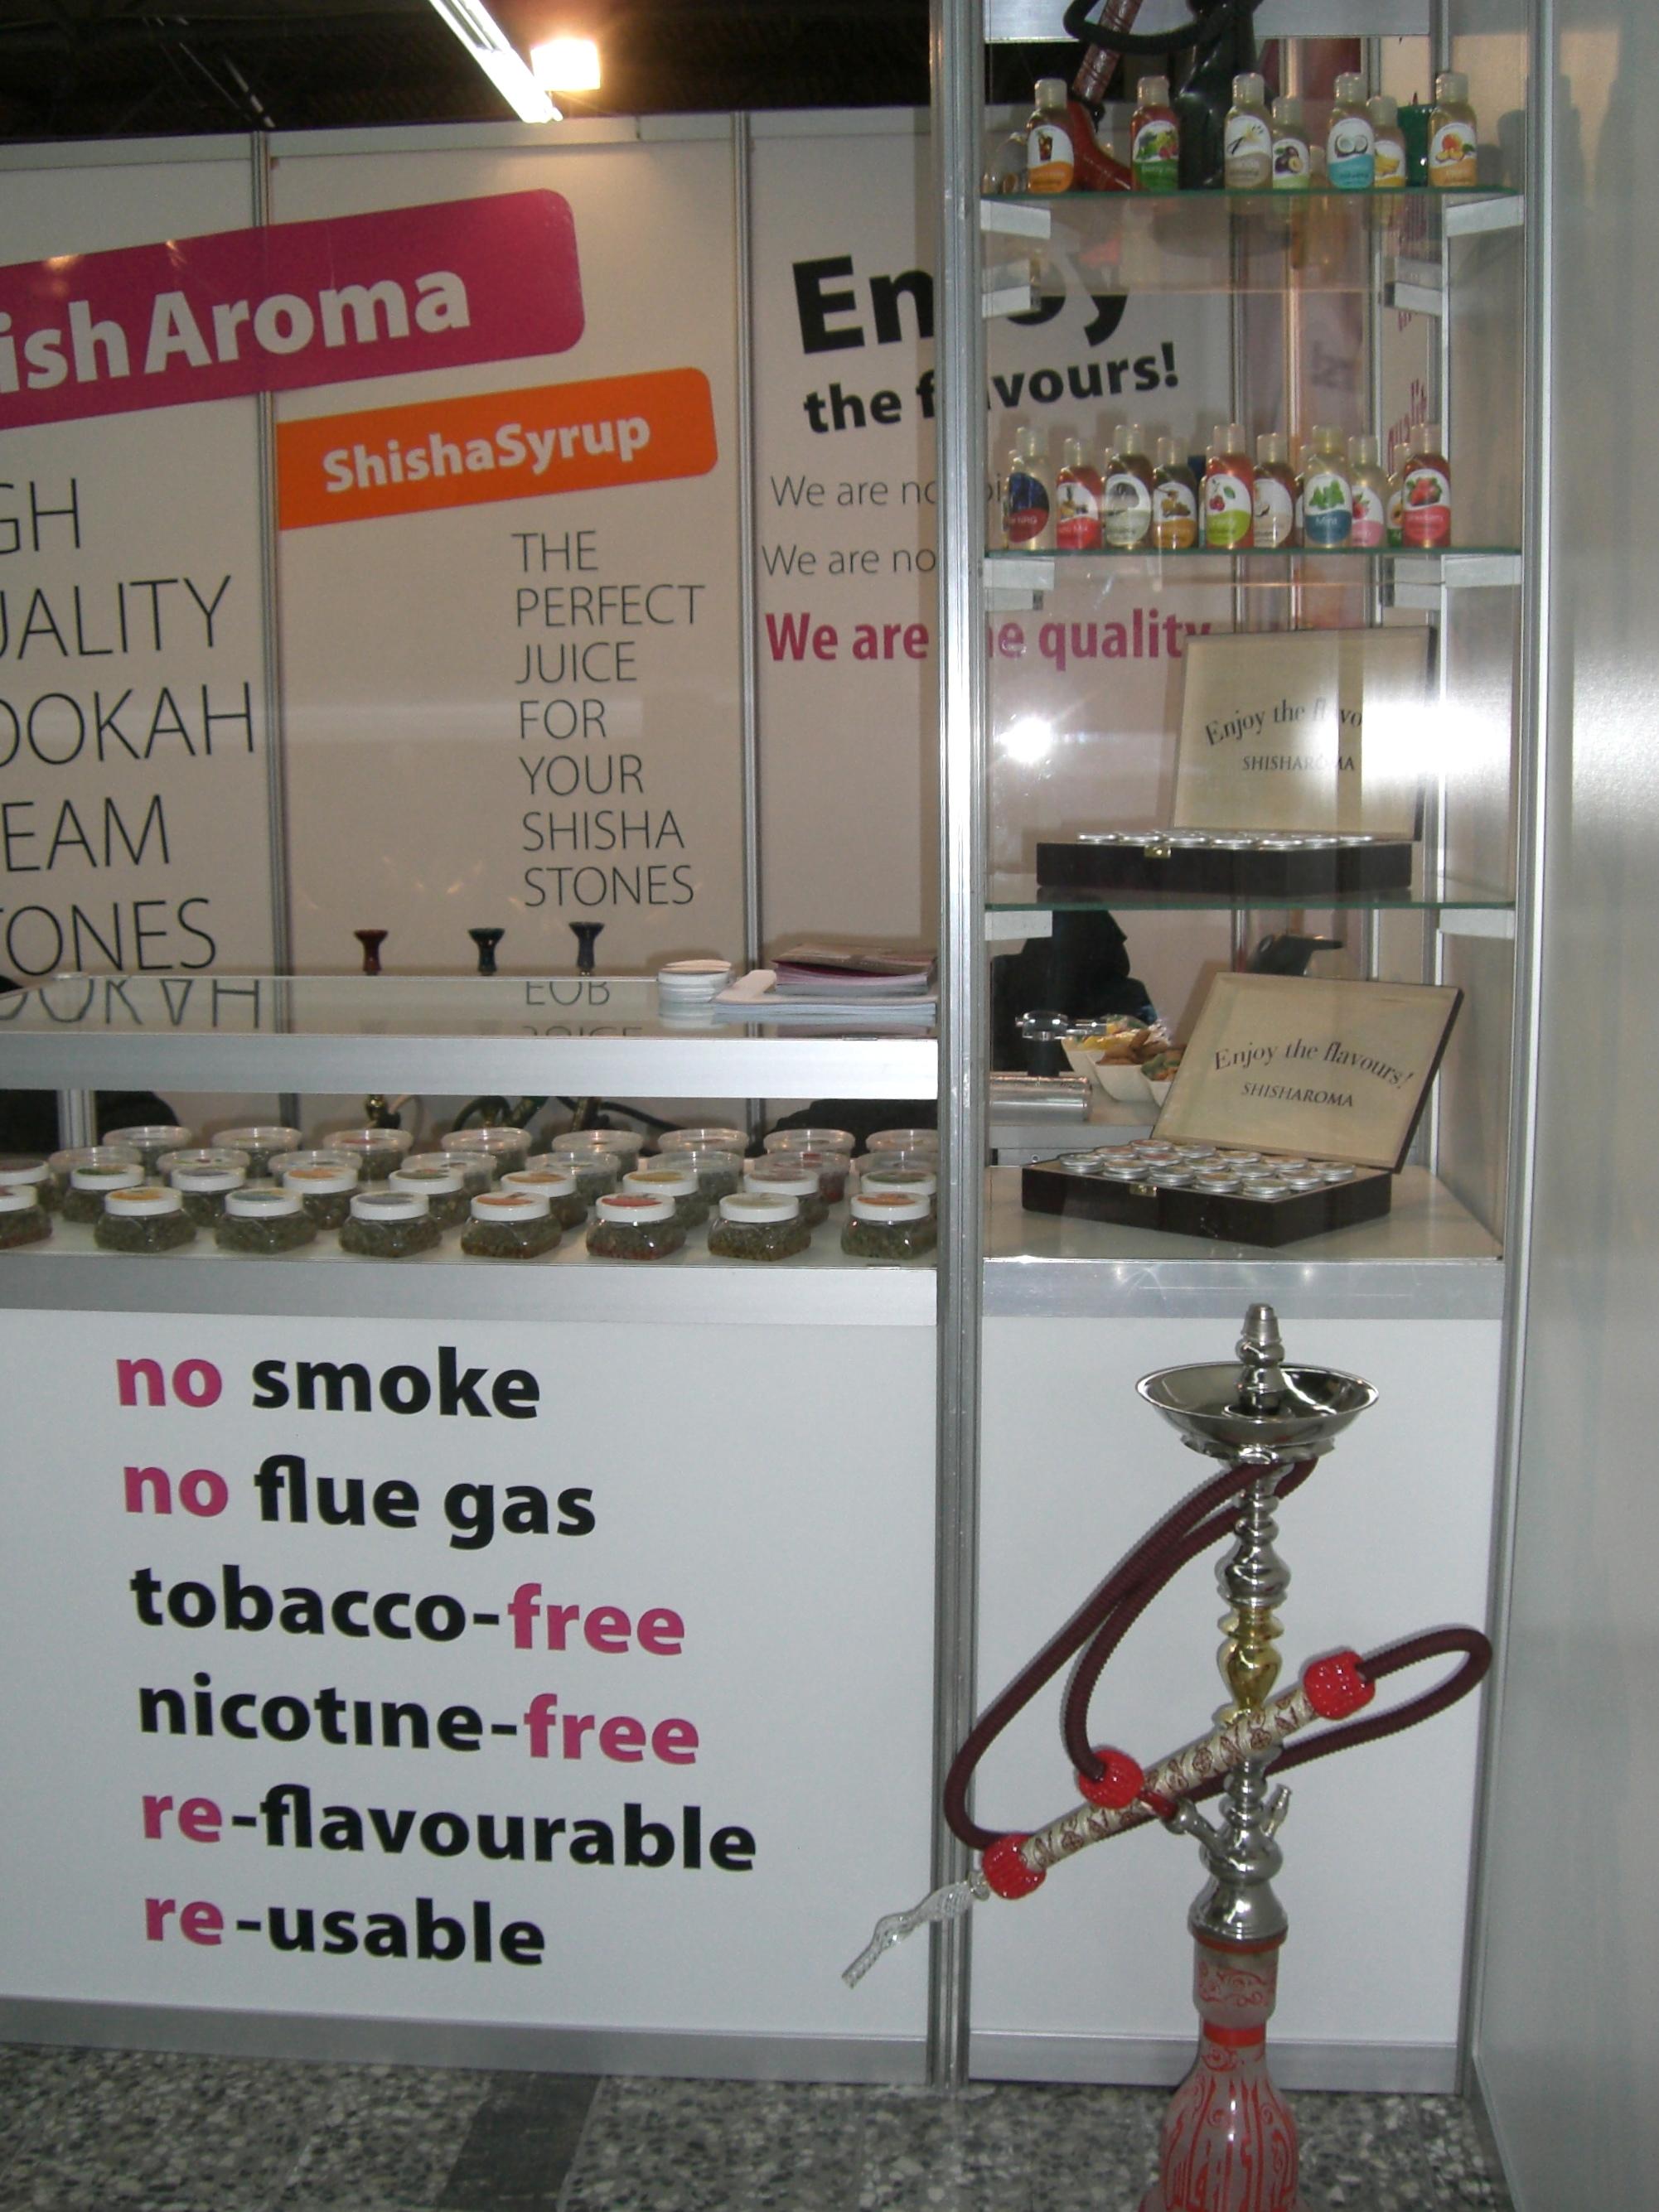 krakow-tobacco-expo-shishasteamstone